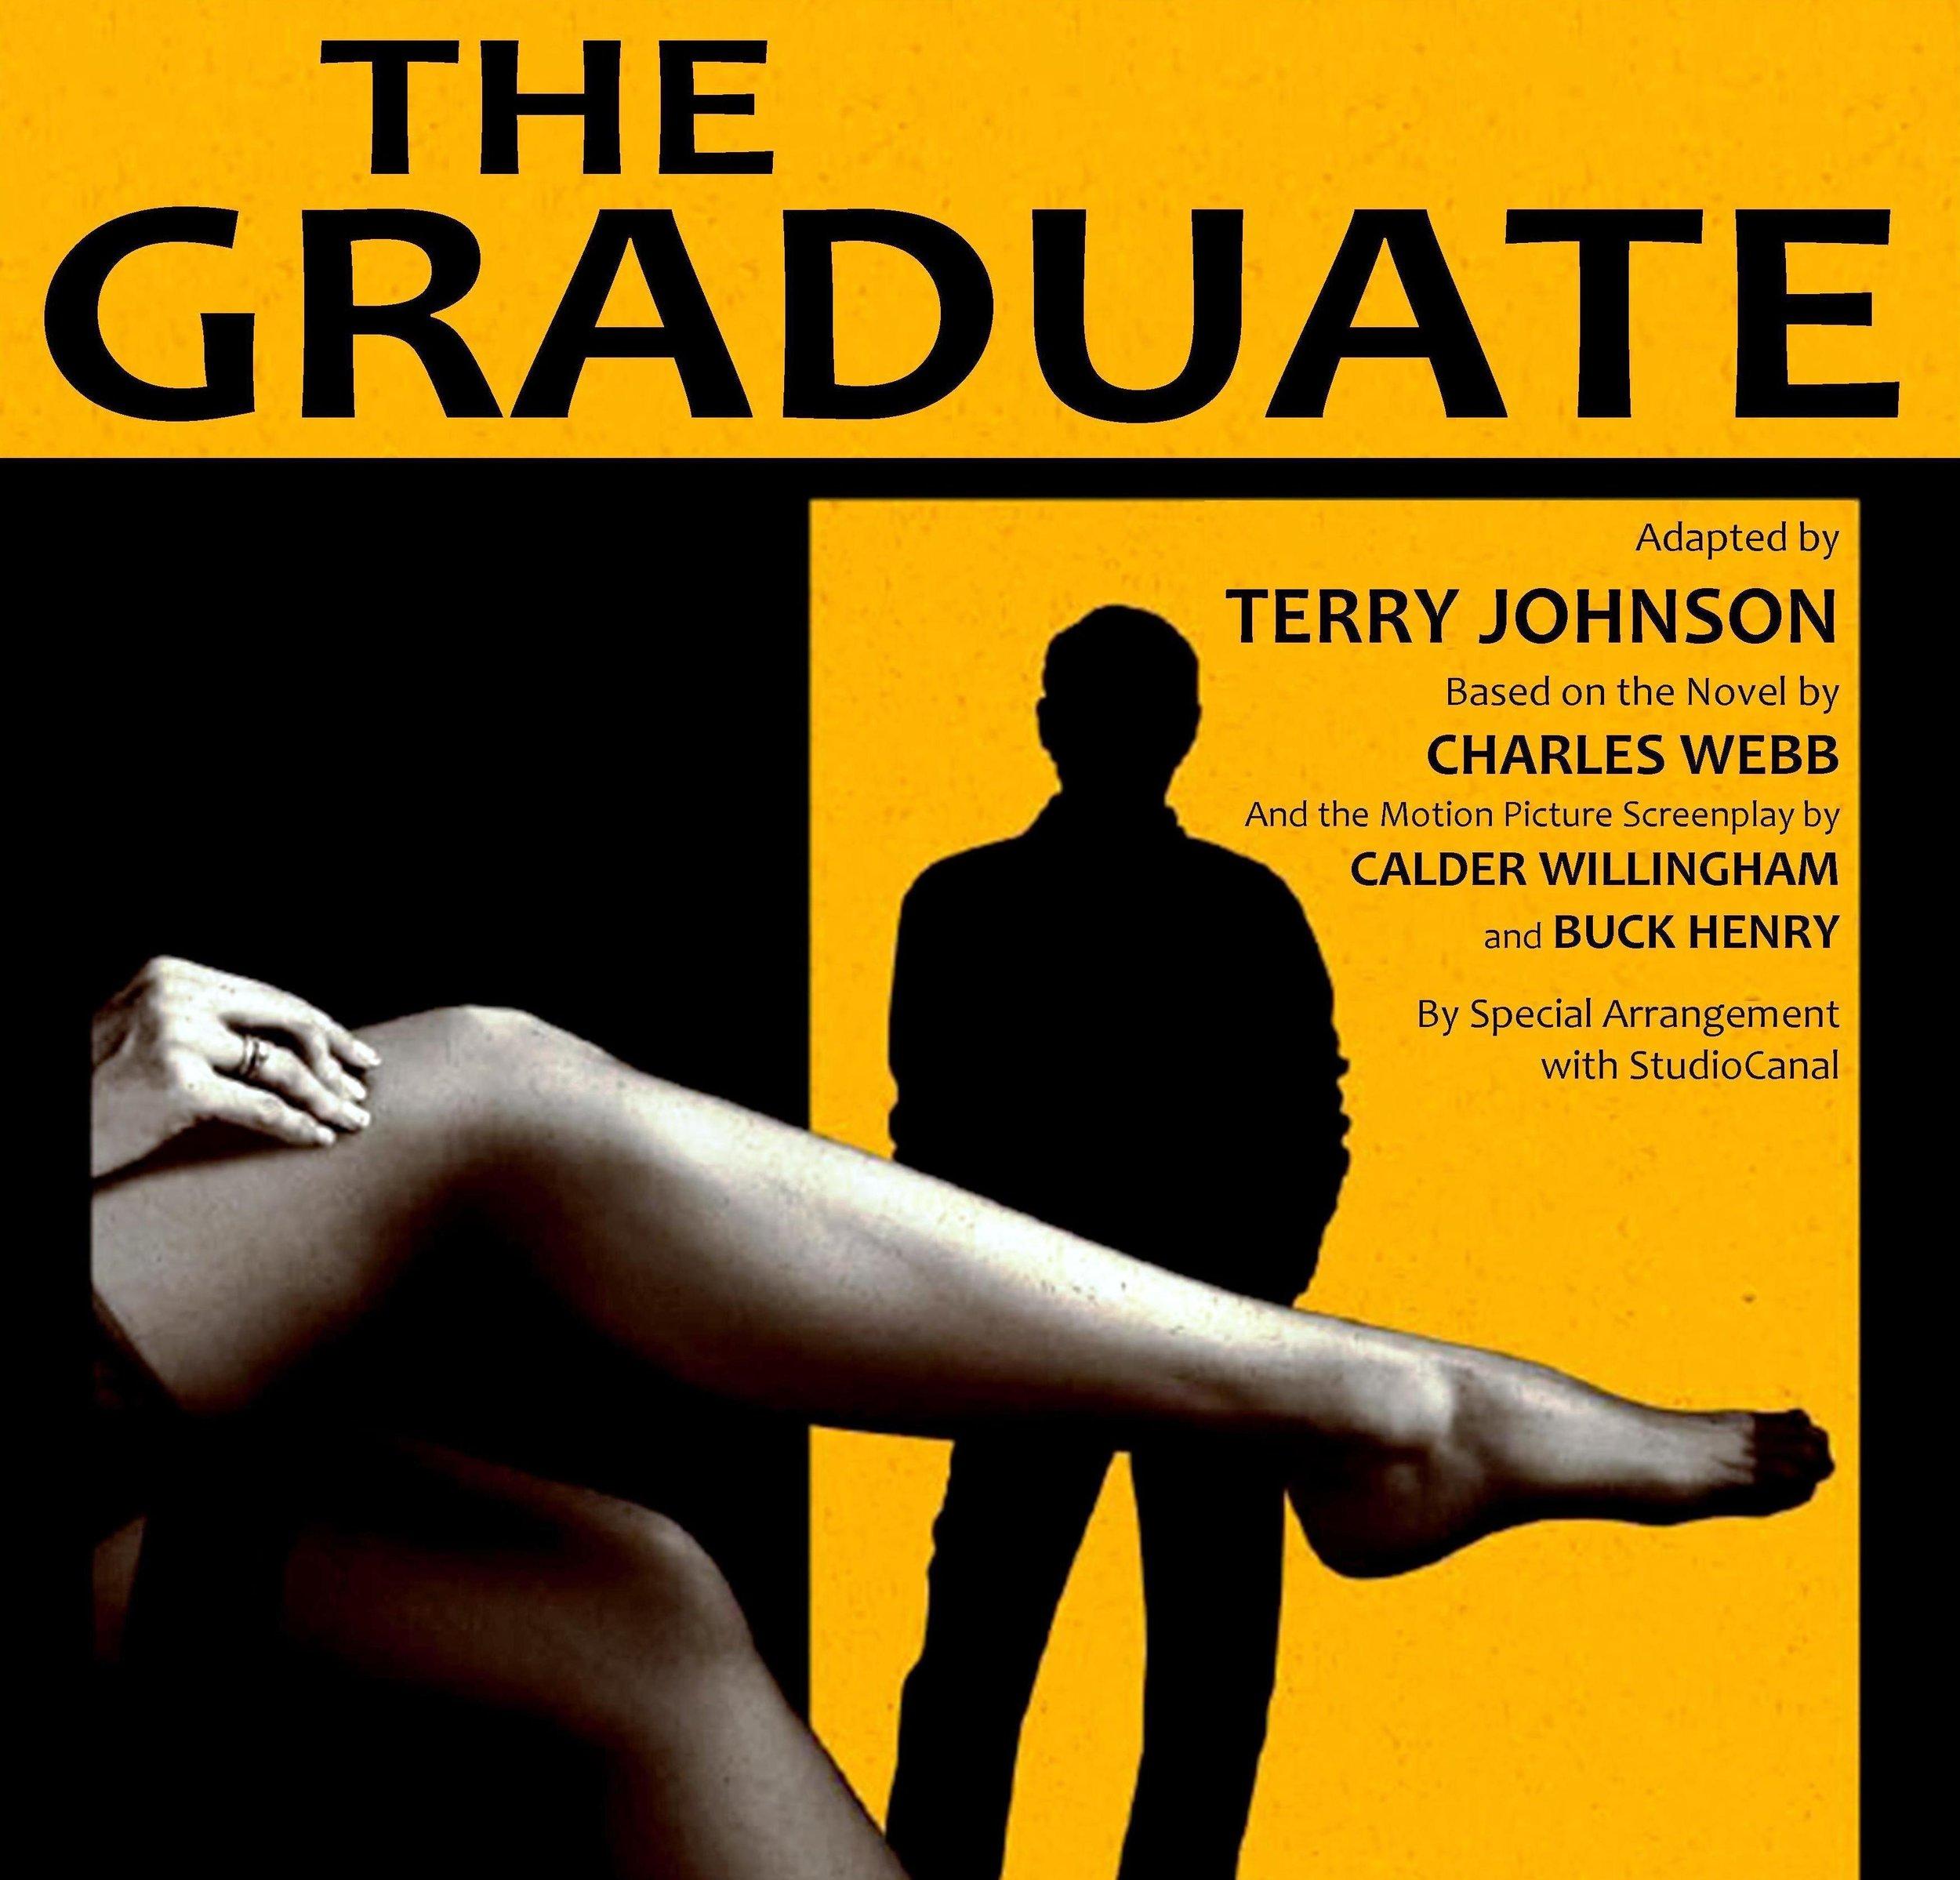 The Graduate Poster.jpg